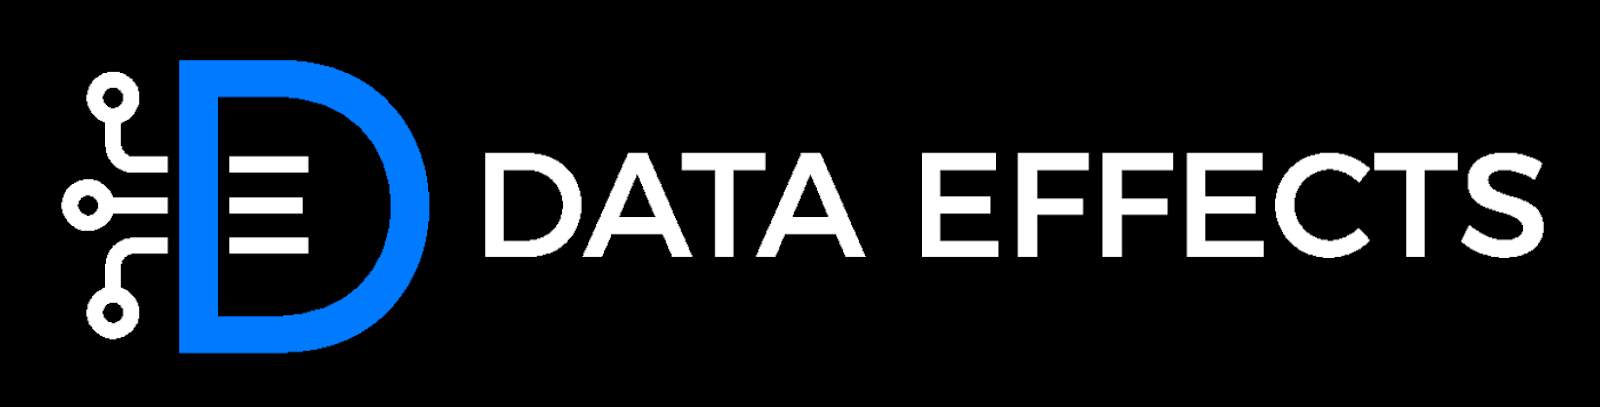 Data Effects